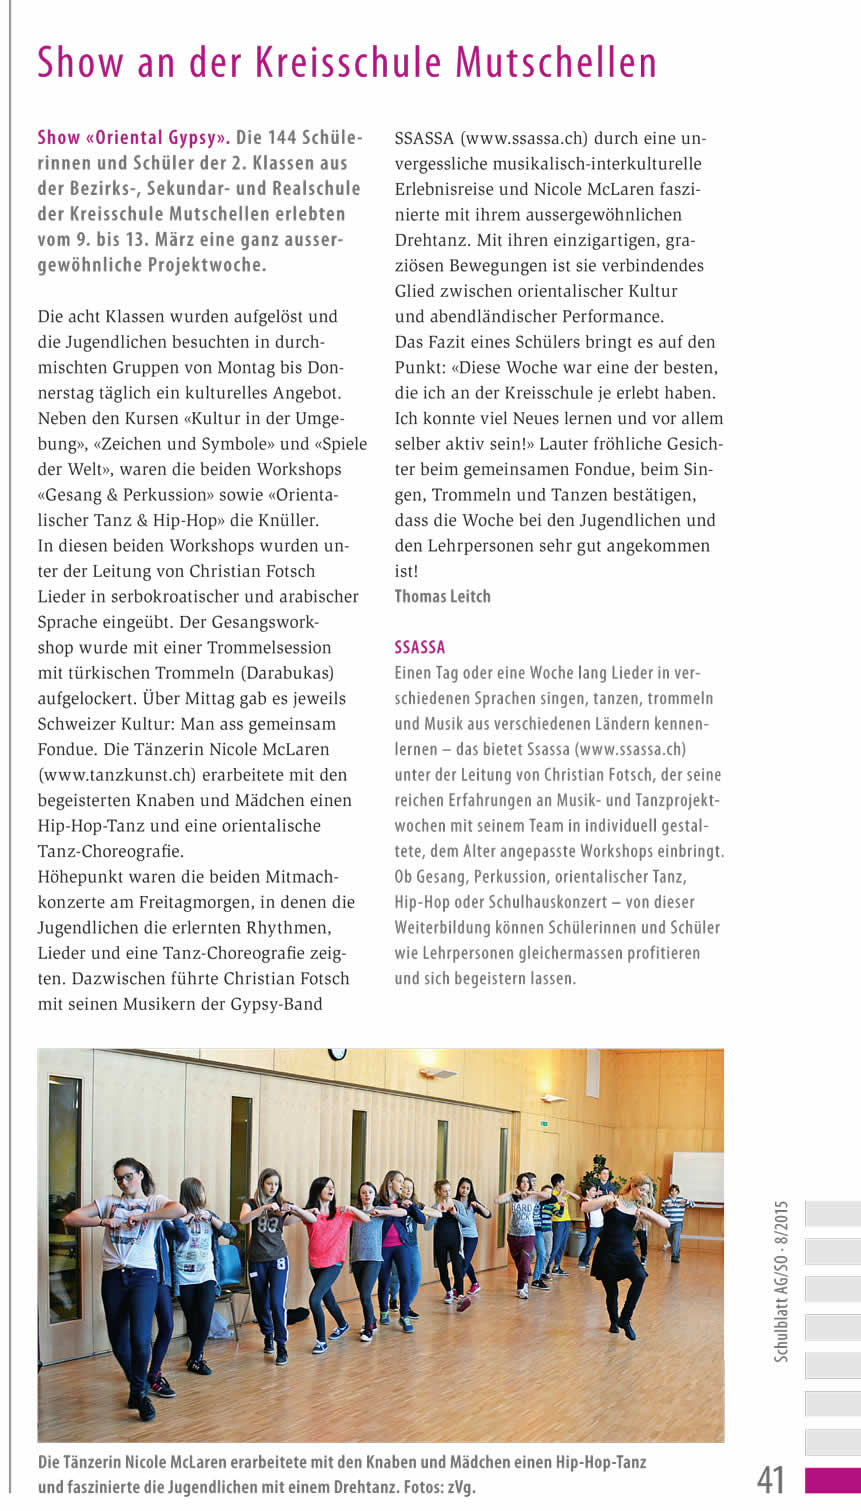 Presseberichte Projektwoche: Ssassa Schulhauskonzert-Projektwoche Berikon 2015